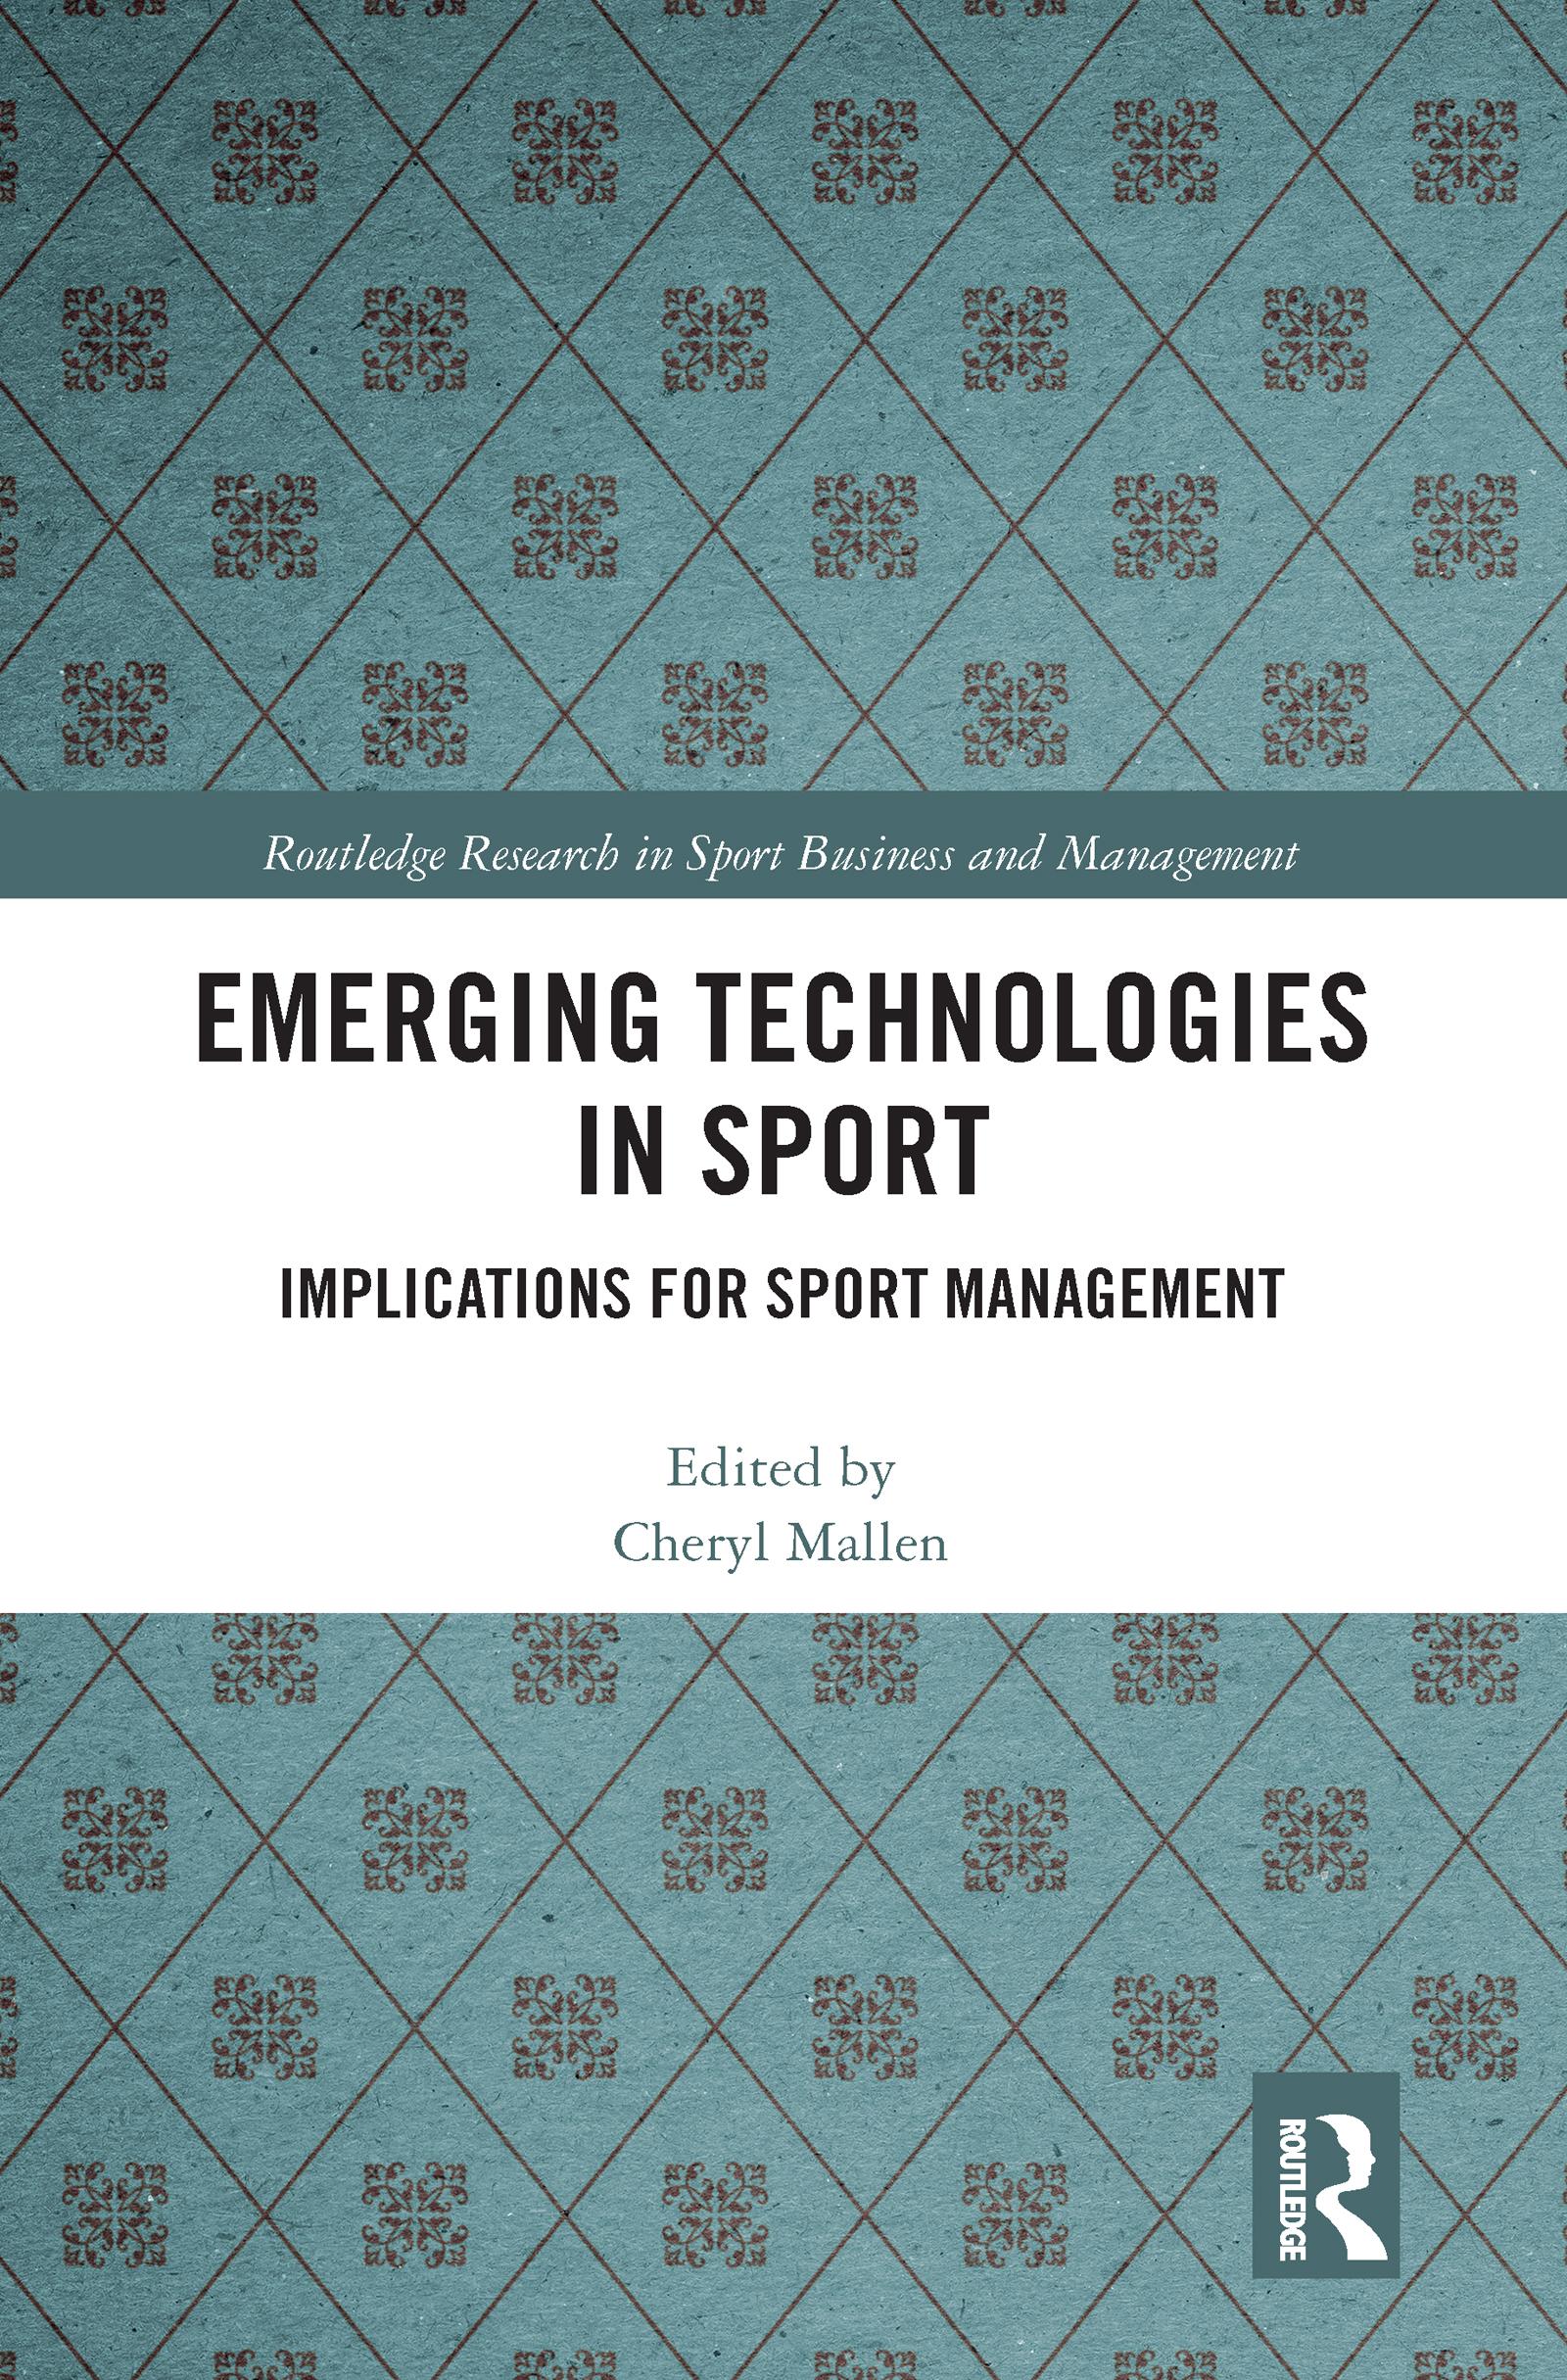 Emerging Technologies in Sport